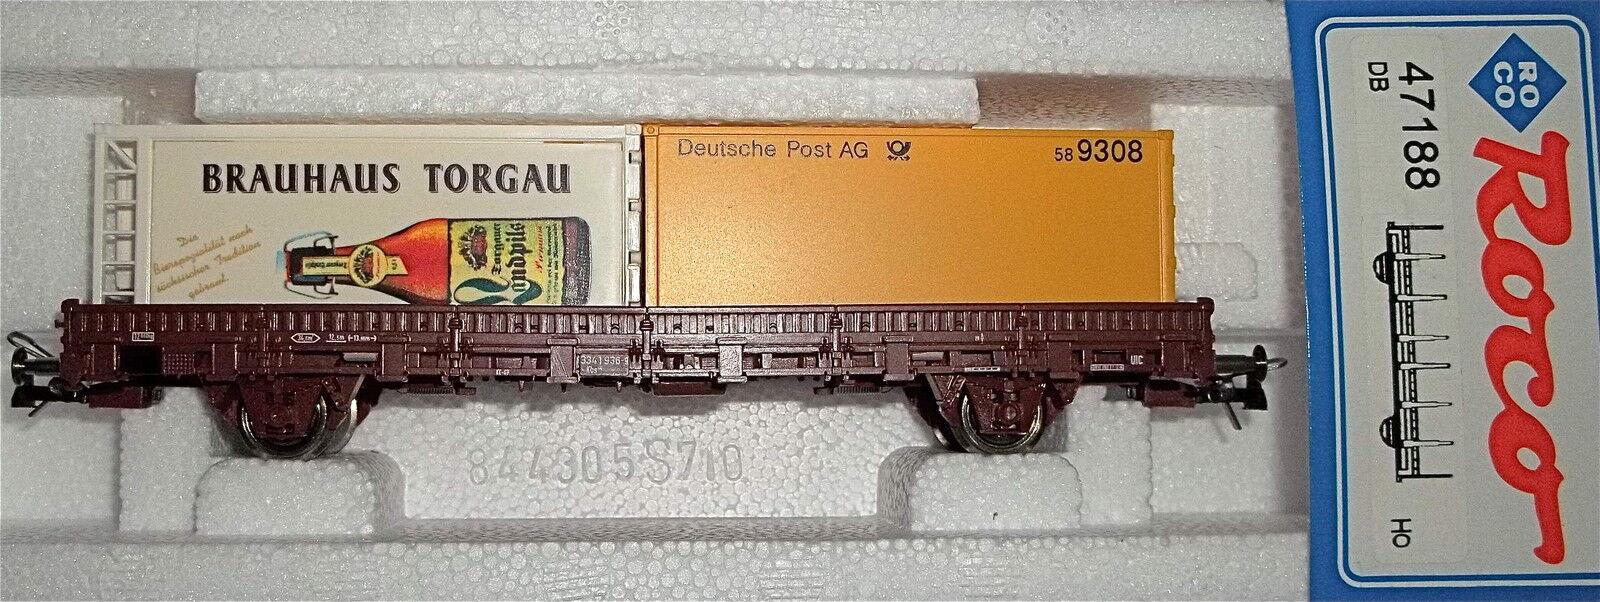 BRAUHAUS TORGAU Allemand Post AG Container wagon plat DB ROCO 47188 H0 HU1 µ